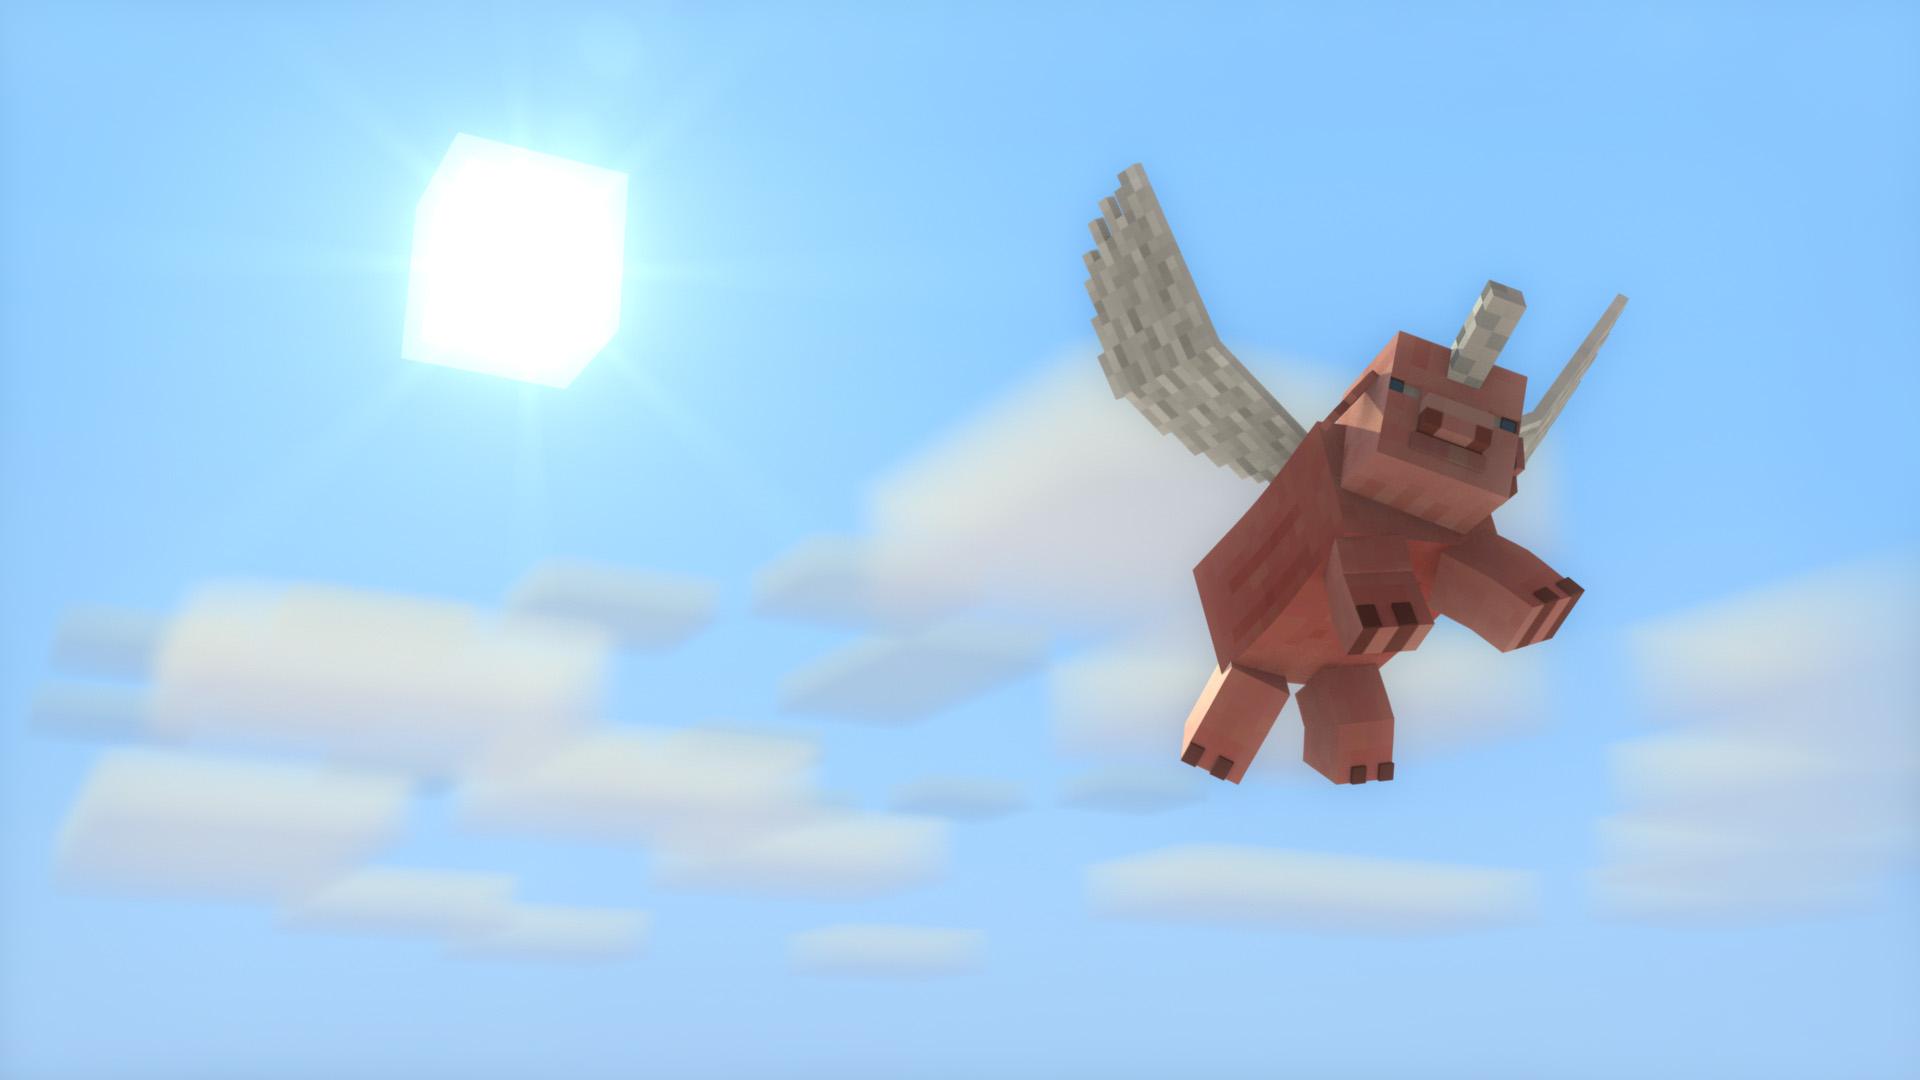 fond-d-écran-minecraft-cochon-volant